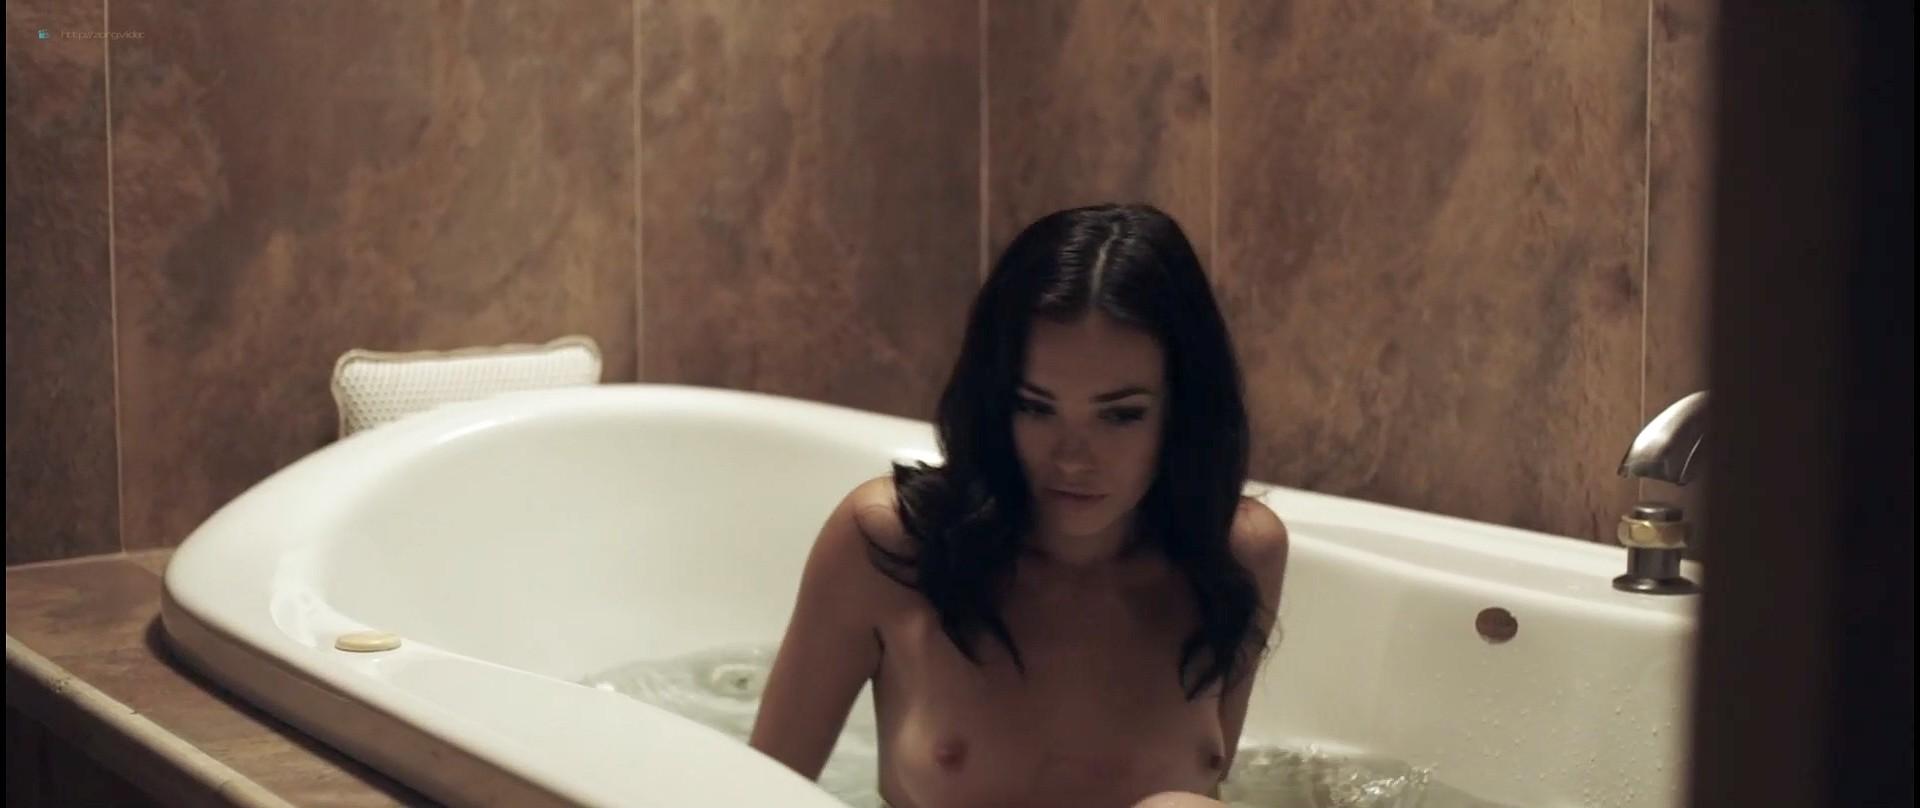 Jemma Dallender nude Rachel Rosenstein nude butt - The Executioners (2018) HD 1080p (14)